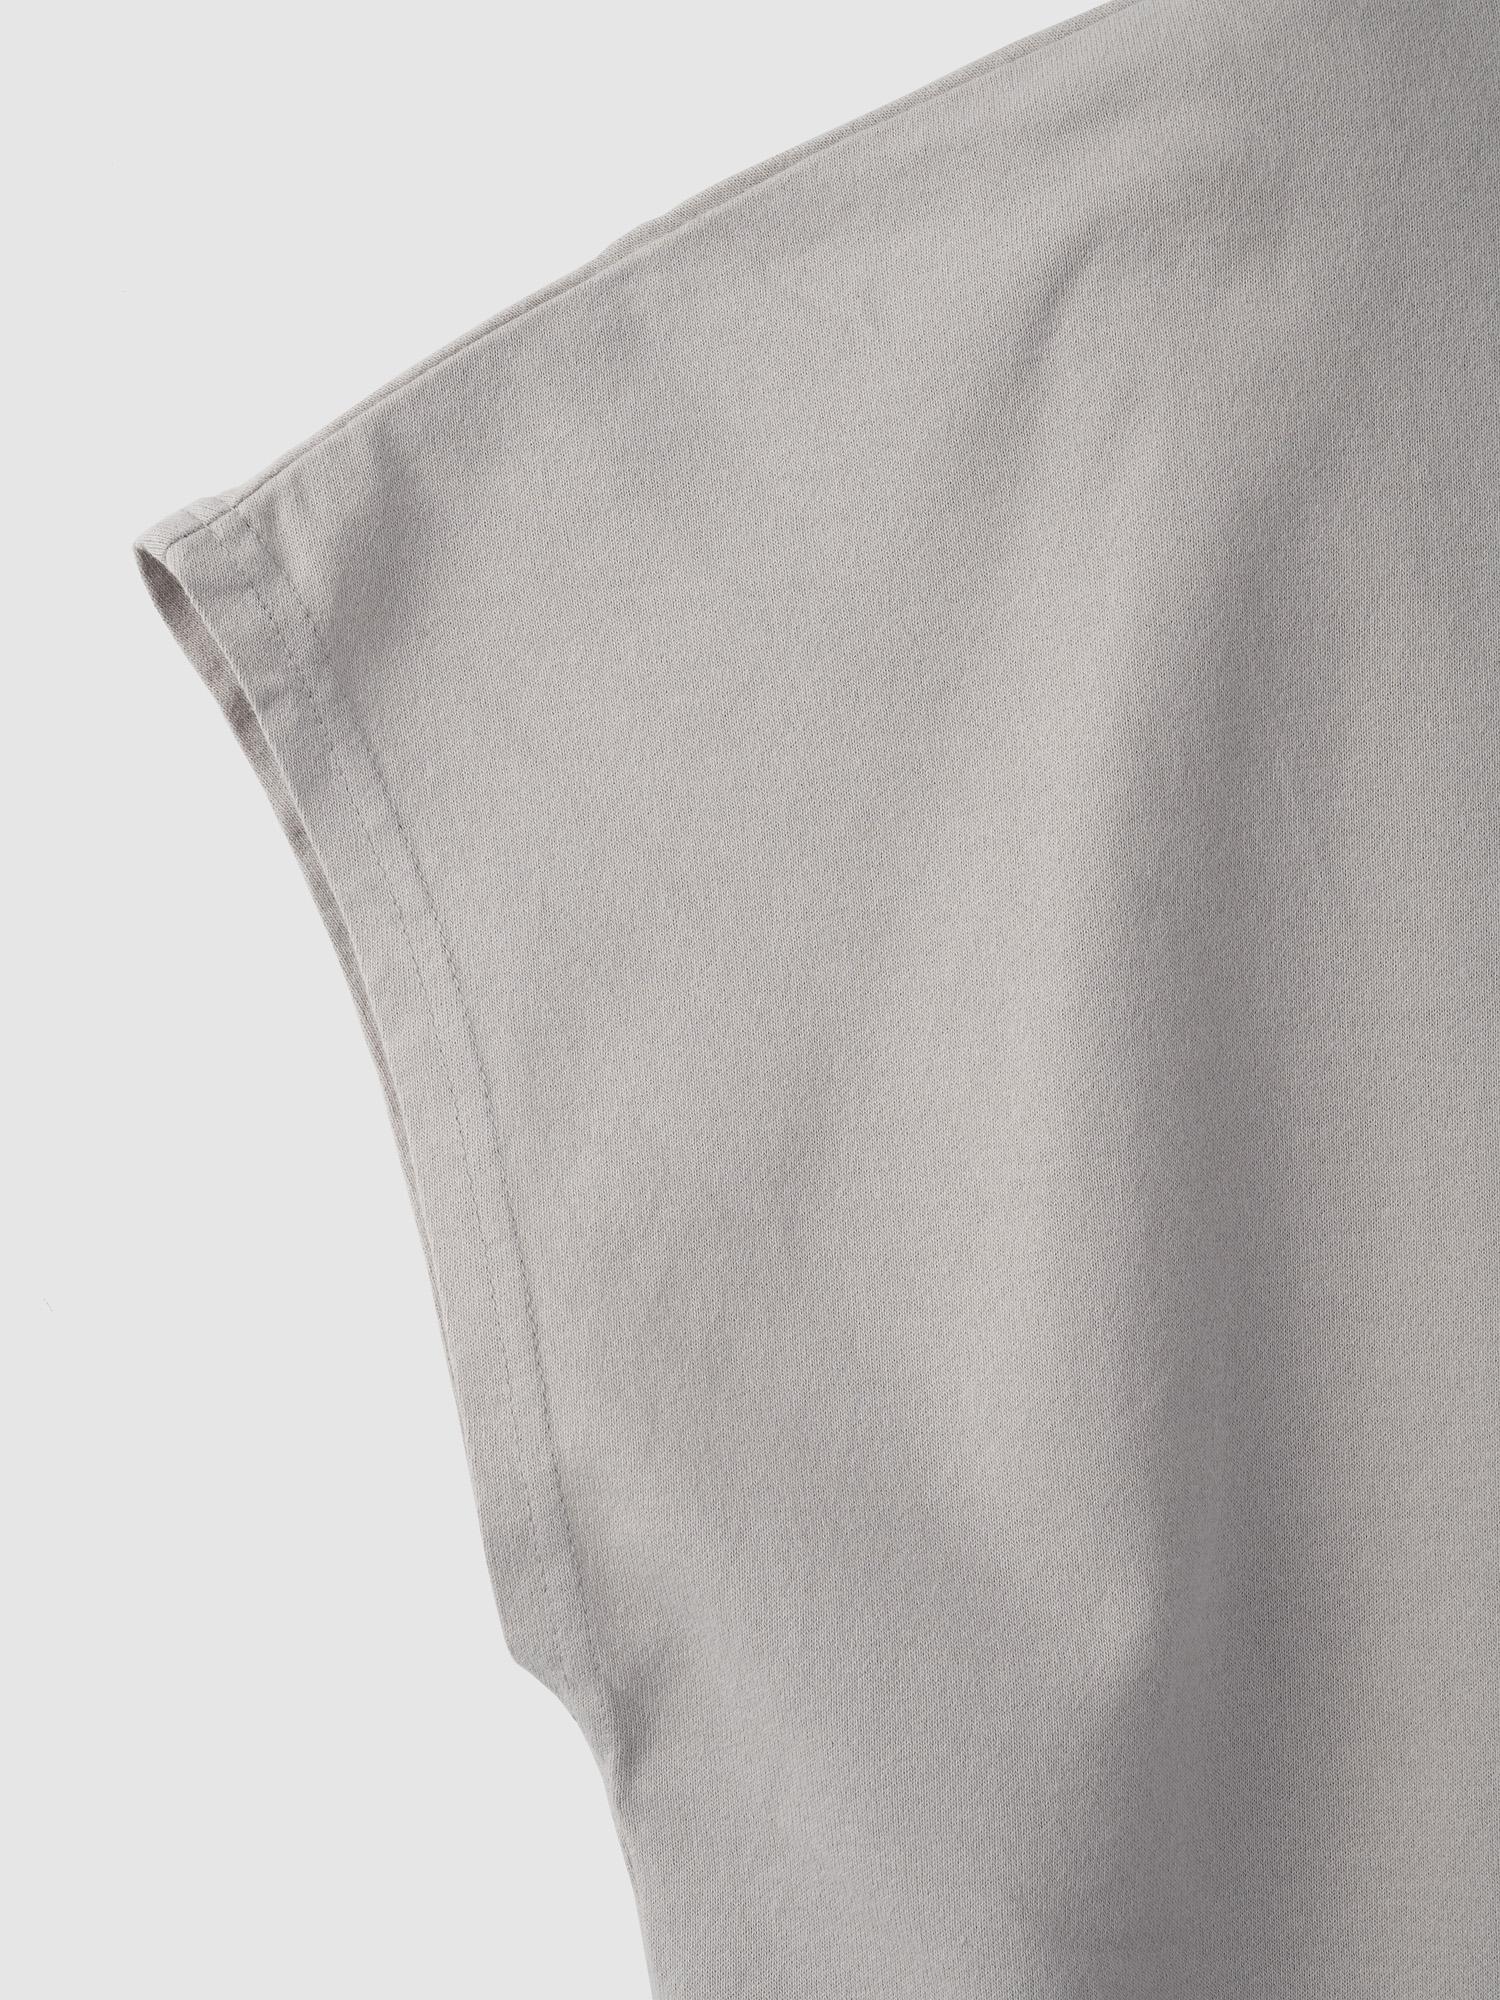 Women's COMFORT DRESS TUNIC T-SHIRTのサムネイル7